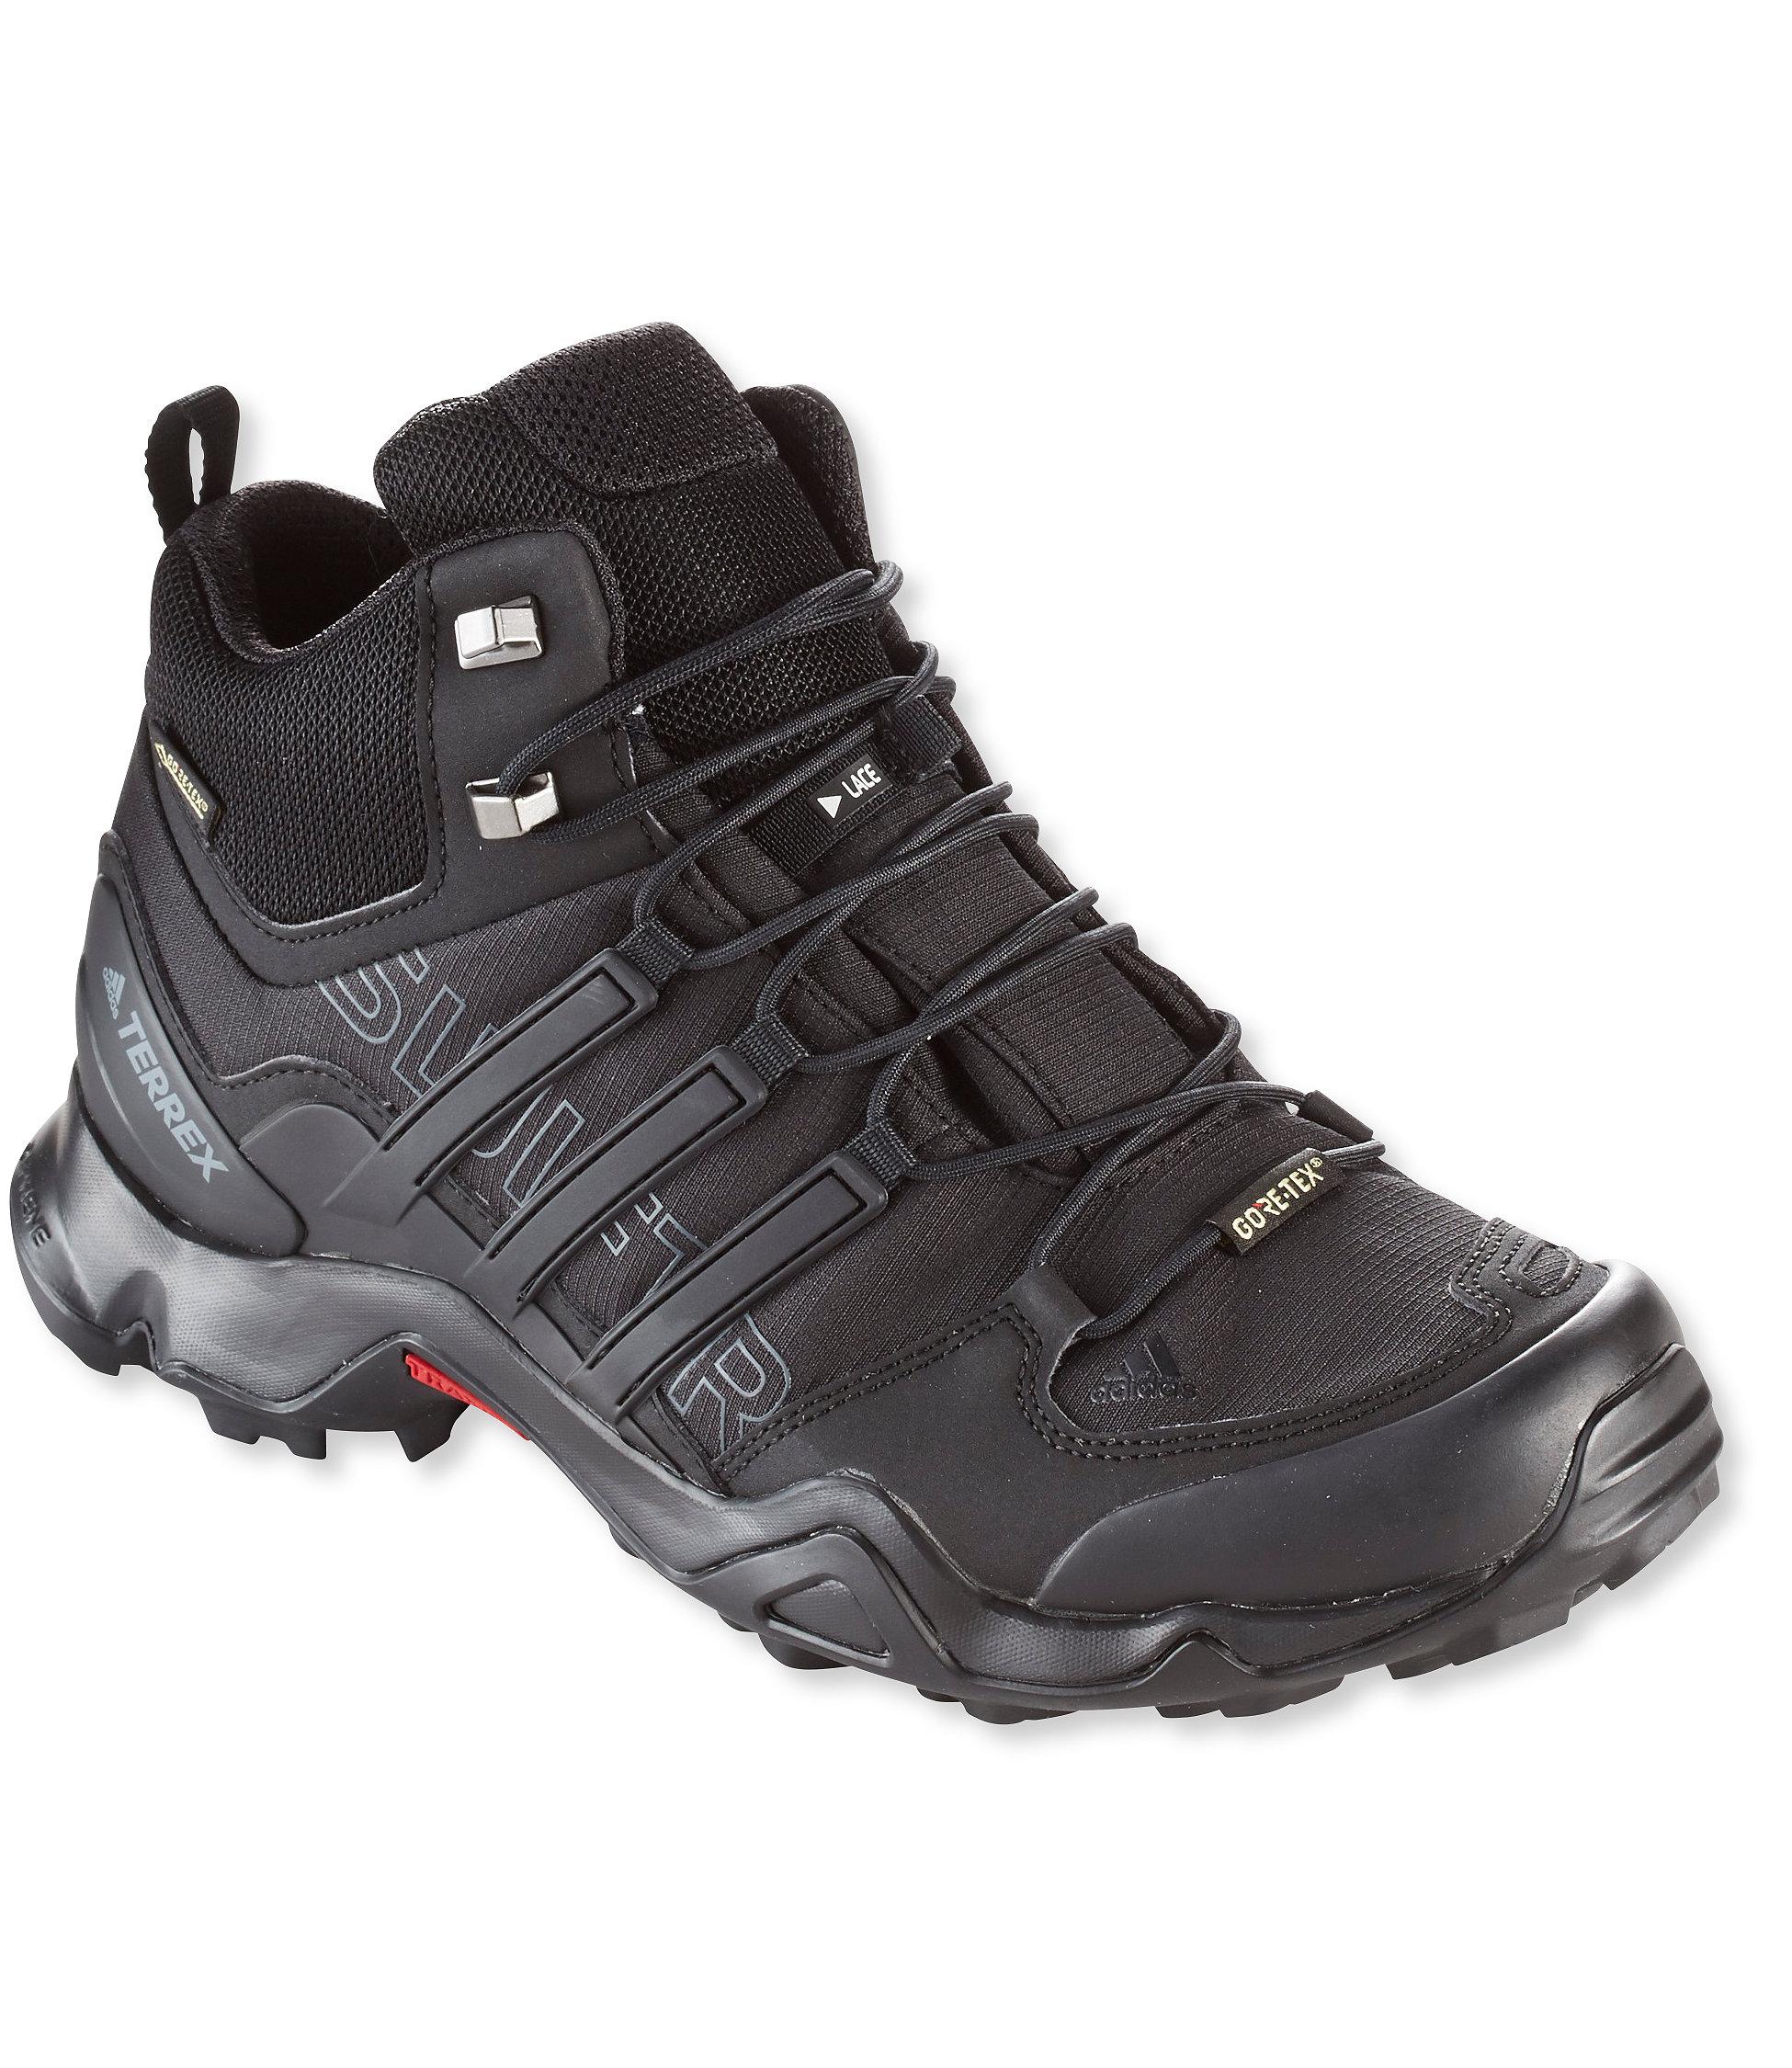 photo: Adidas Men's Terrex Swift R Mid GTX hiking boot